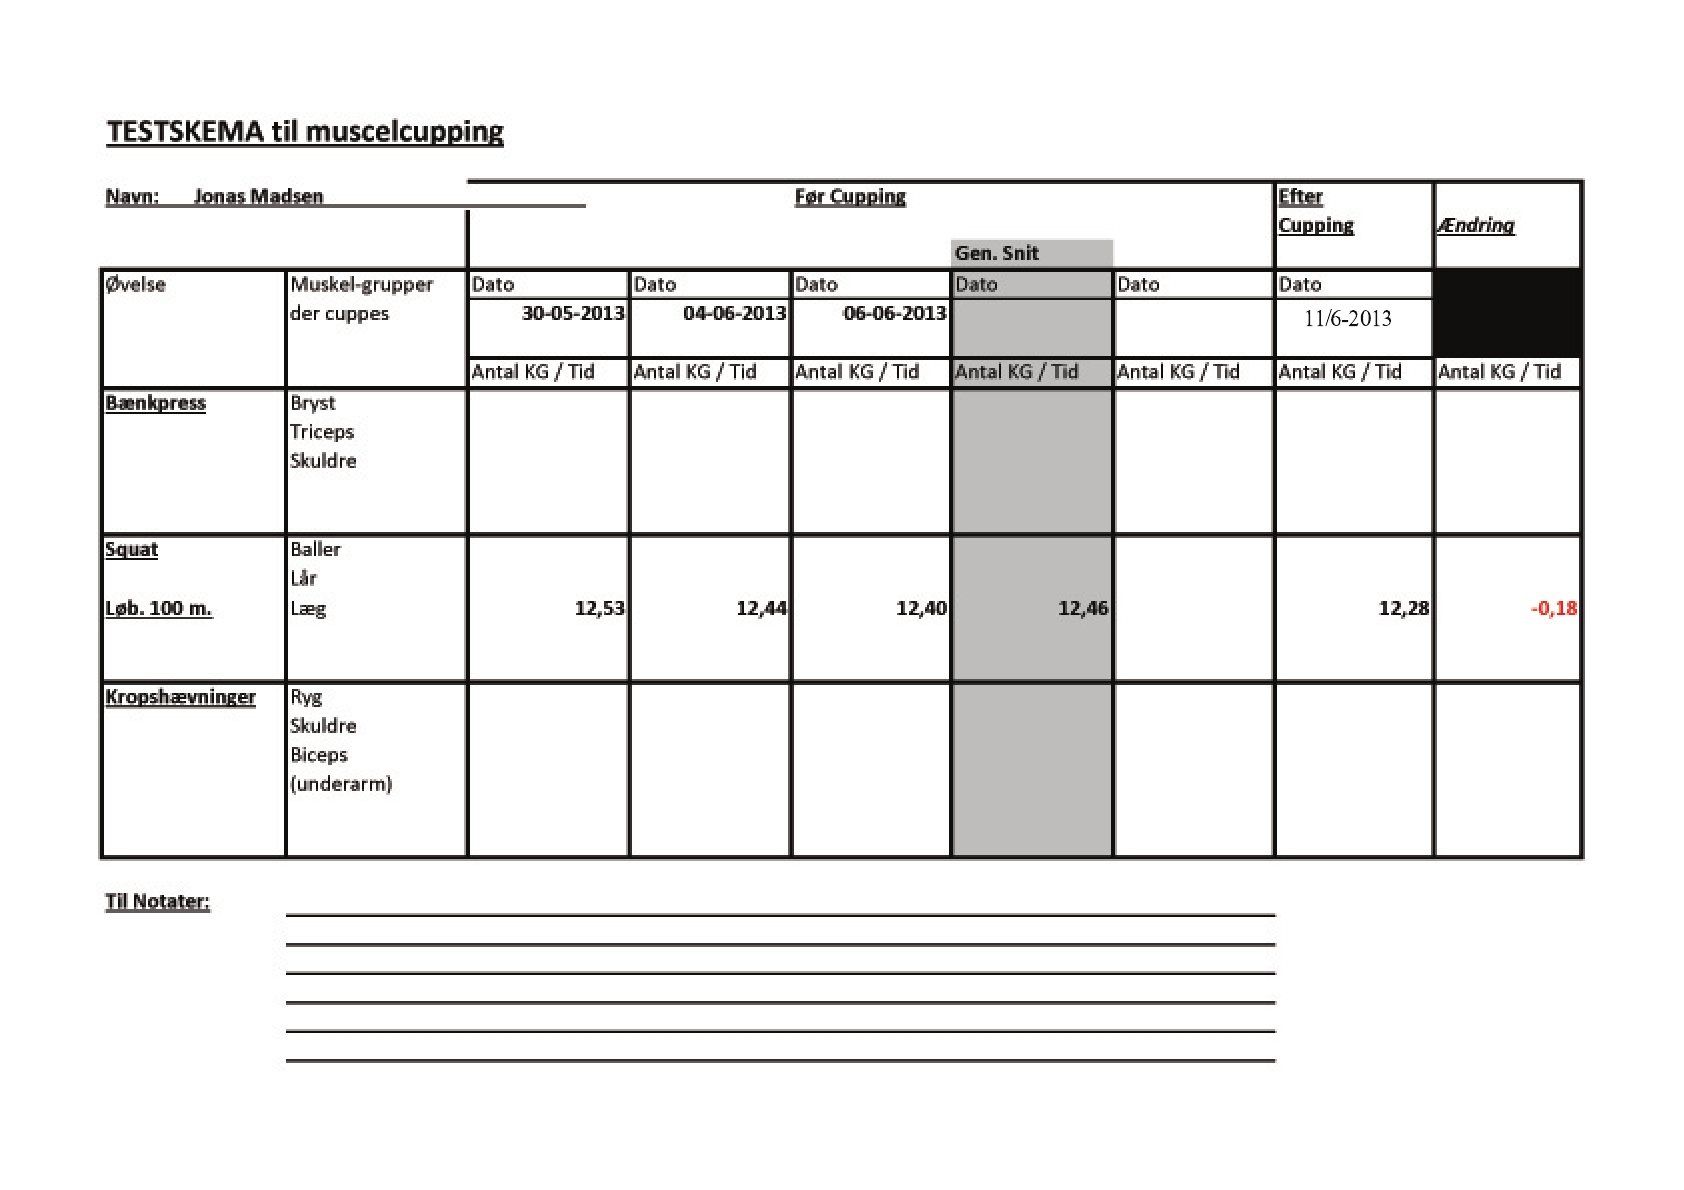 jonas-madsen-100m-lb-testskema